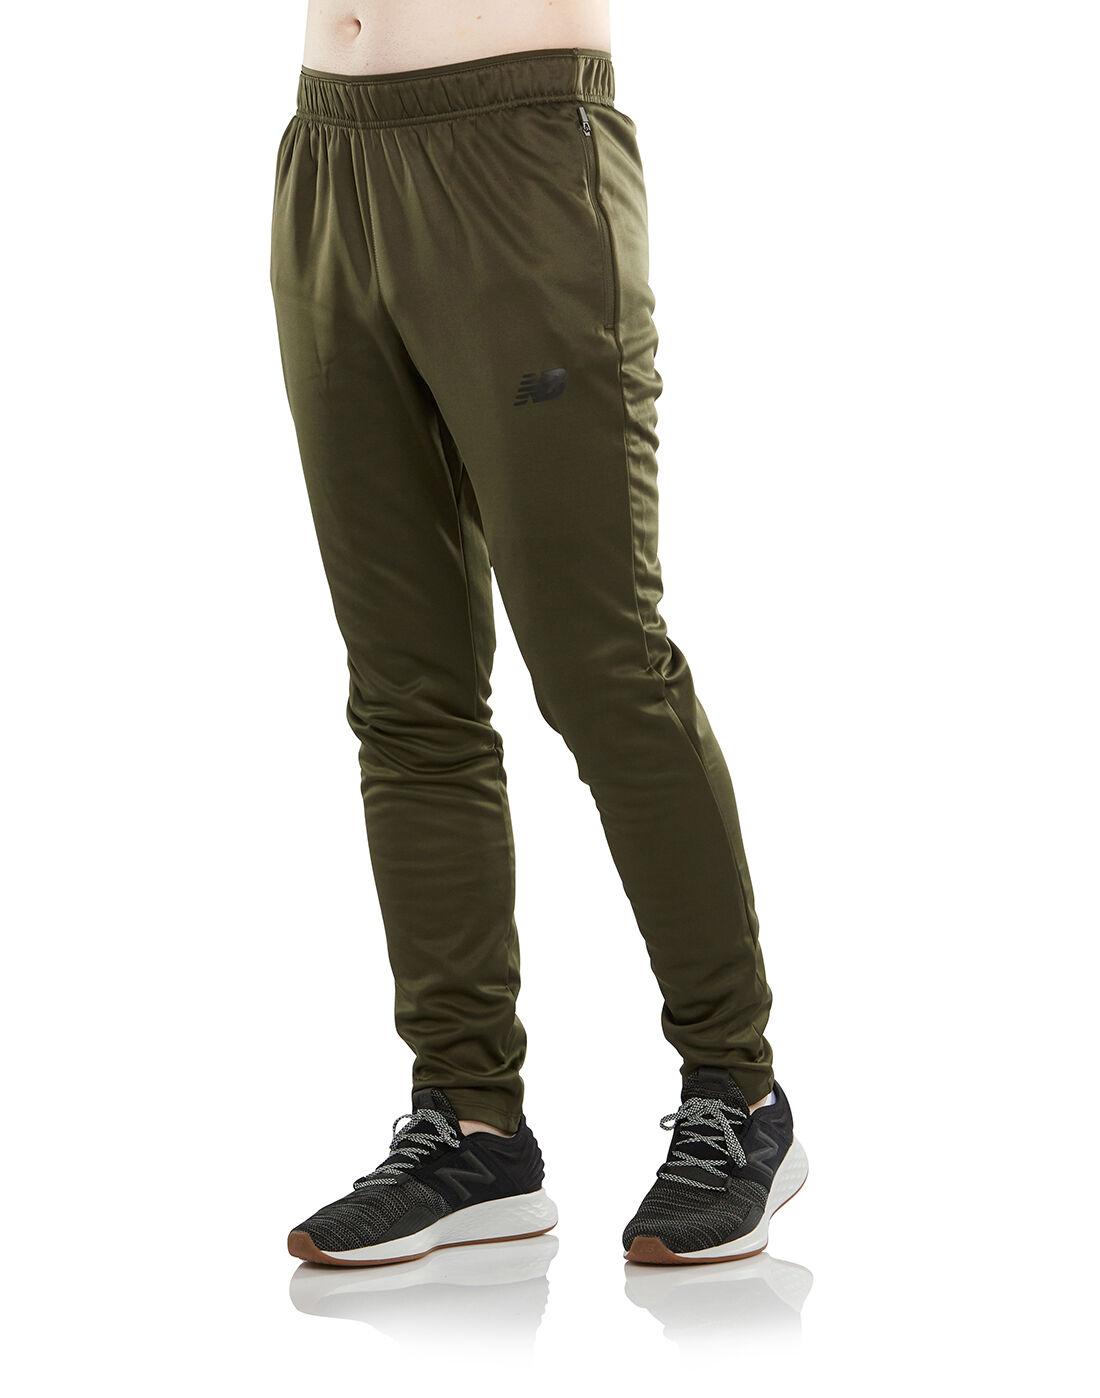 New Balance Mens Street Training Knit Slim Pants